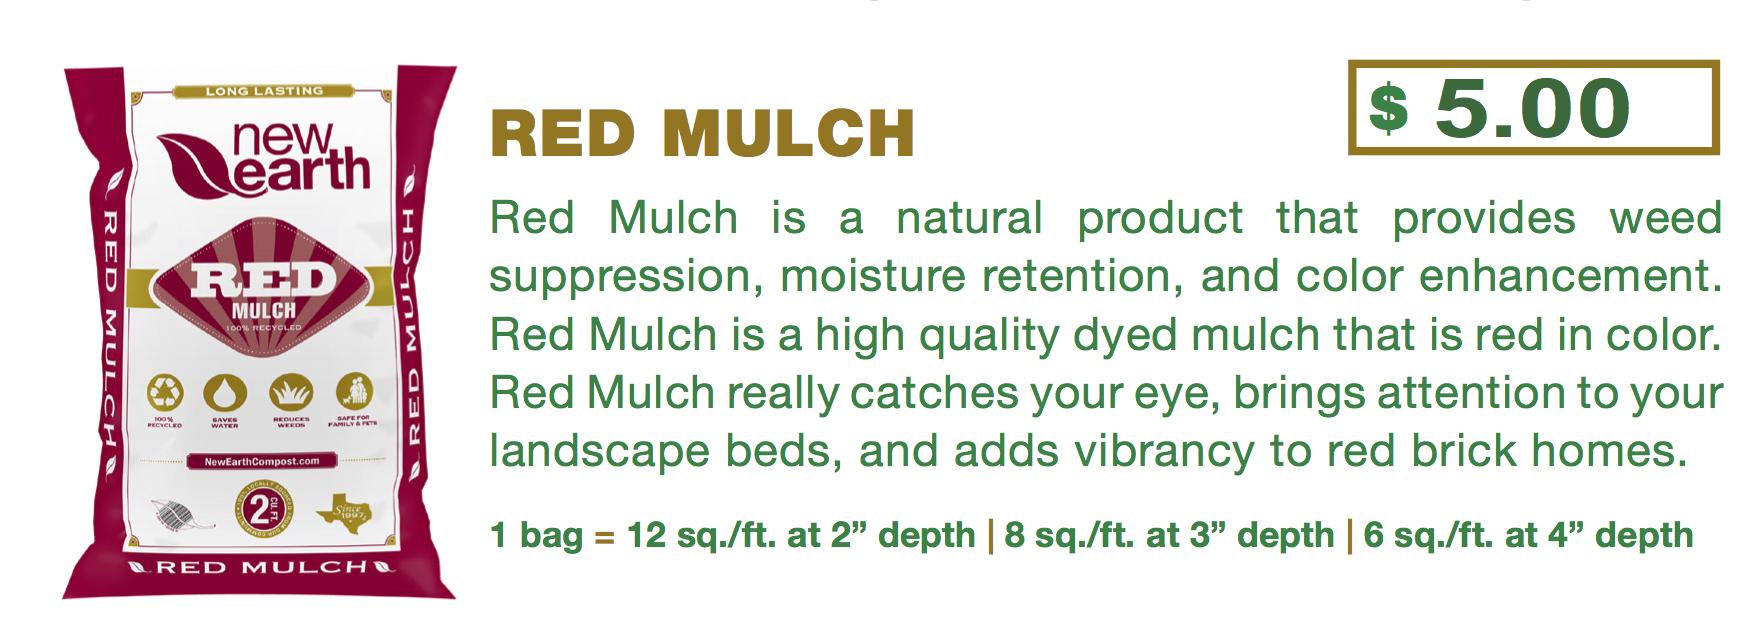 MulchFundraiserflyer 1.18.19.jpg